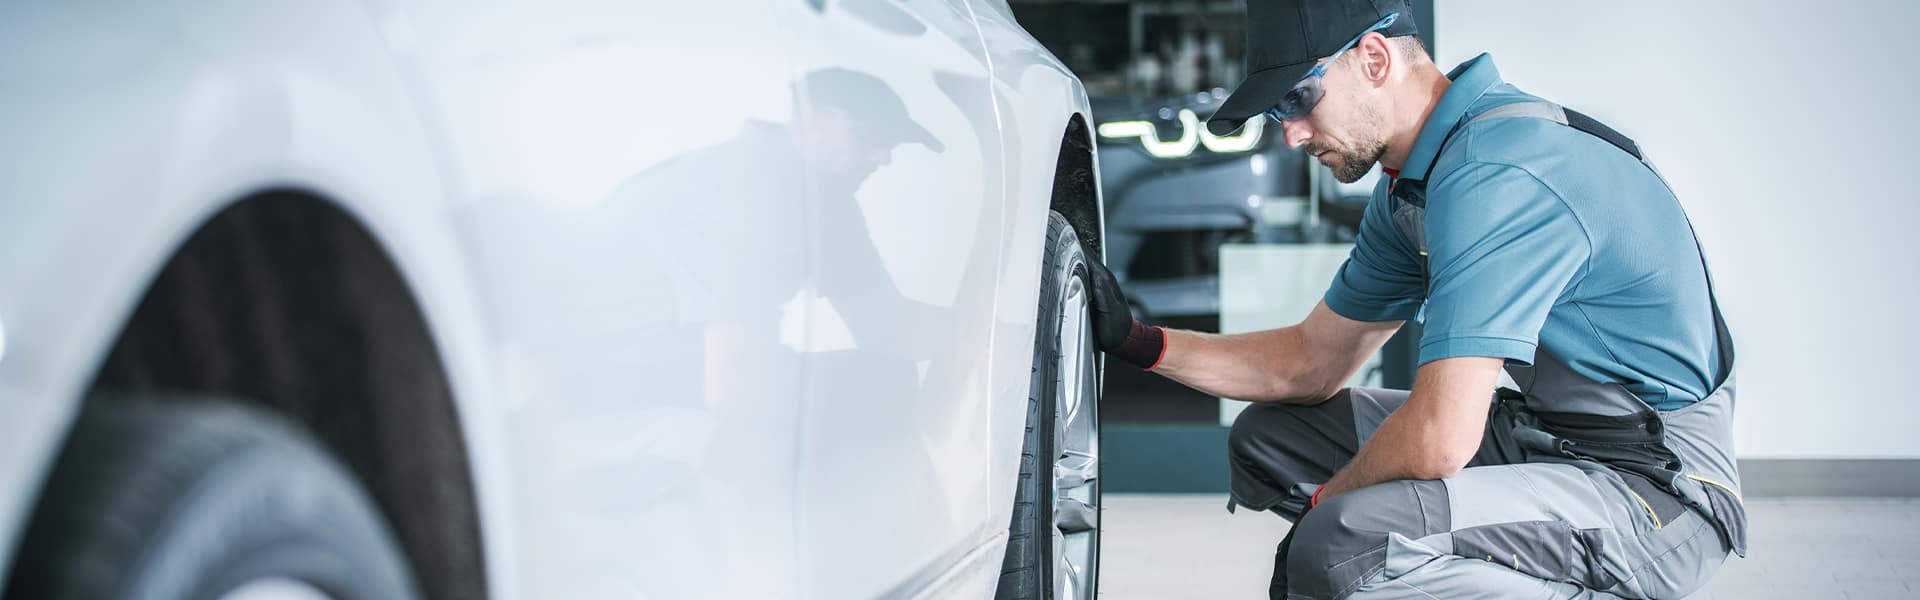 Bennett Maserati of Allentown is a Car Dealership near Bethlehem PA | Service Advisor Replacing Tire on White Sedan